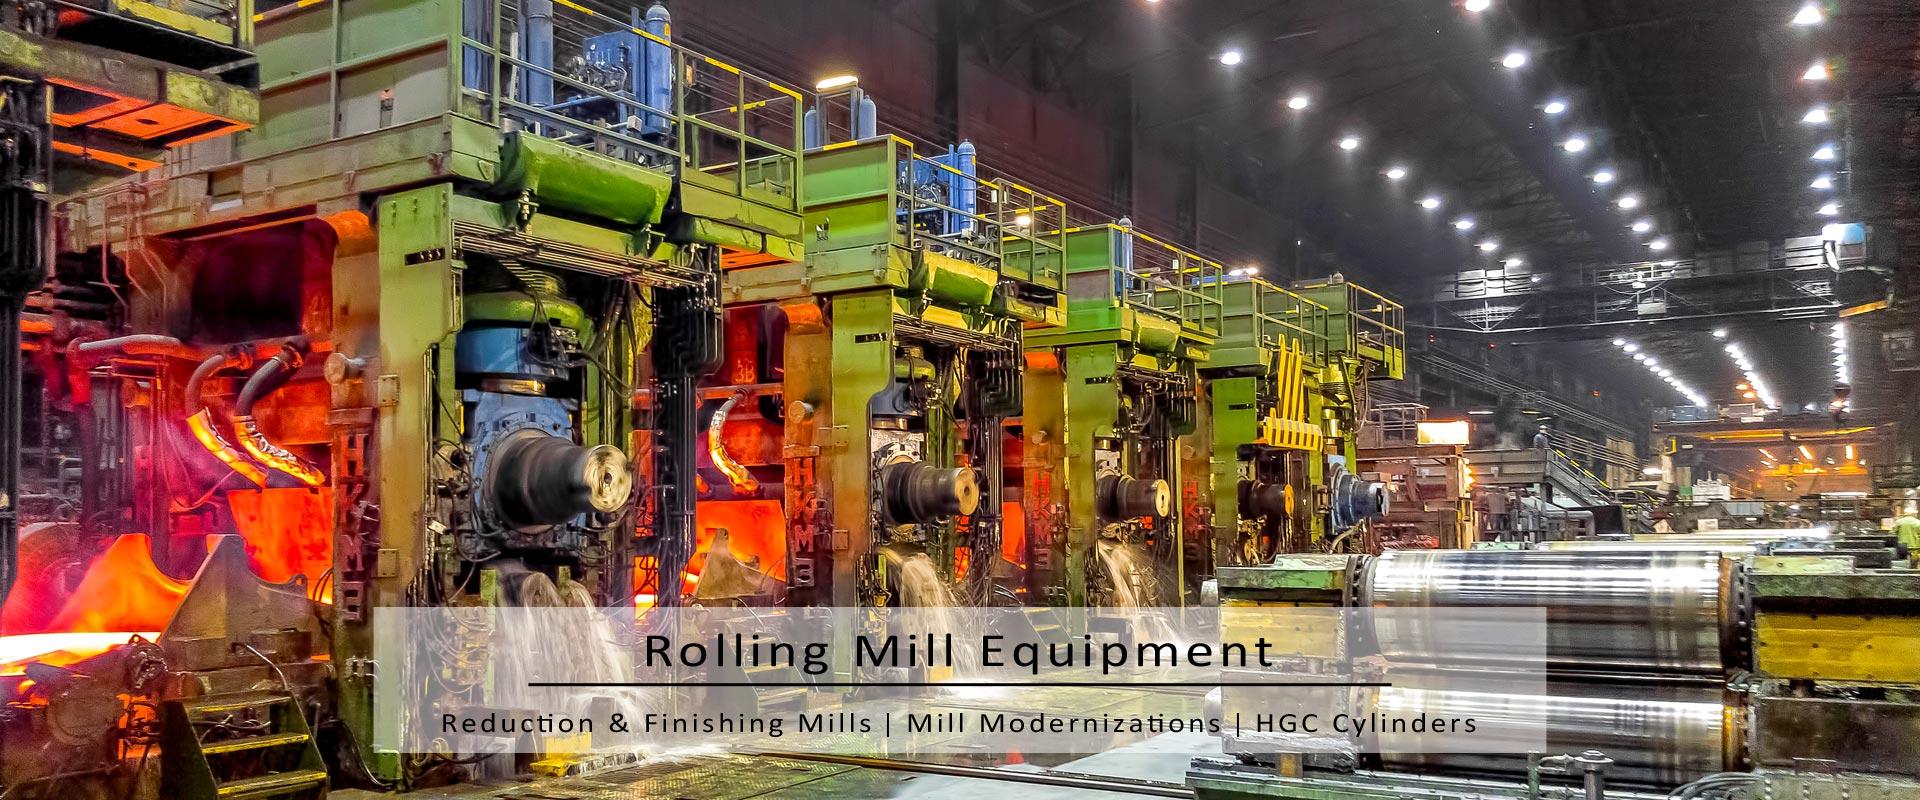 B S MACHINE TOOLS, Ludhiana - Manufacturer of Steel Rolling